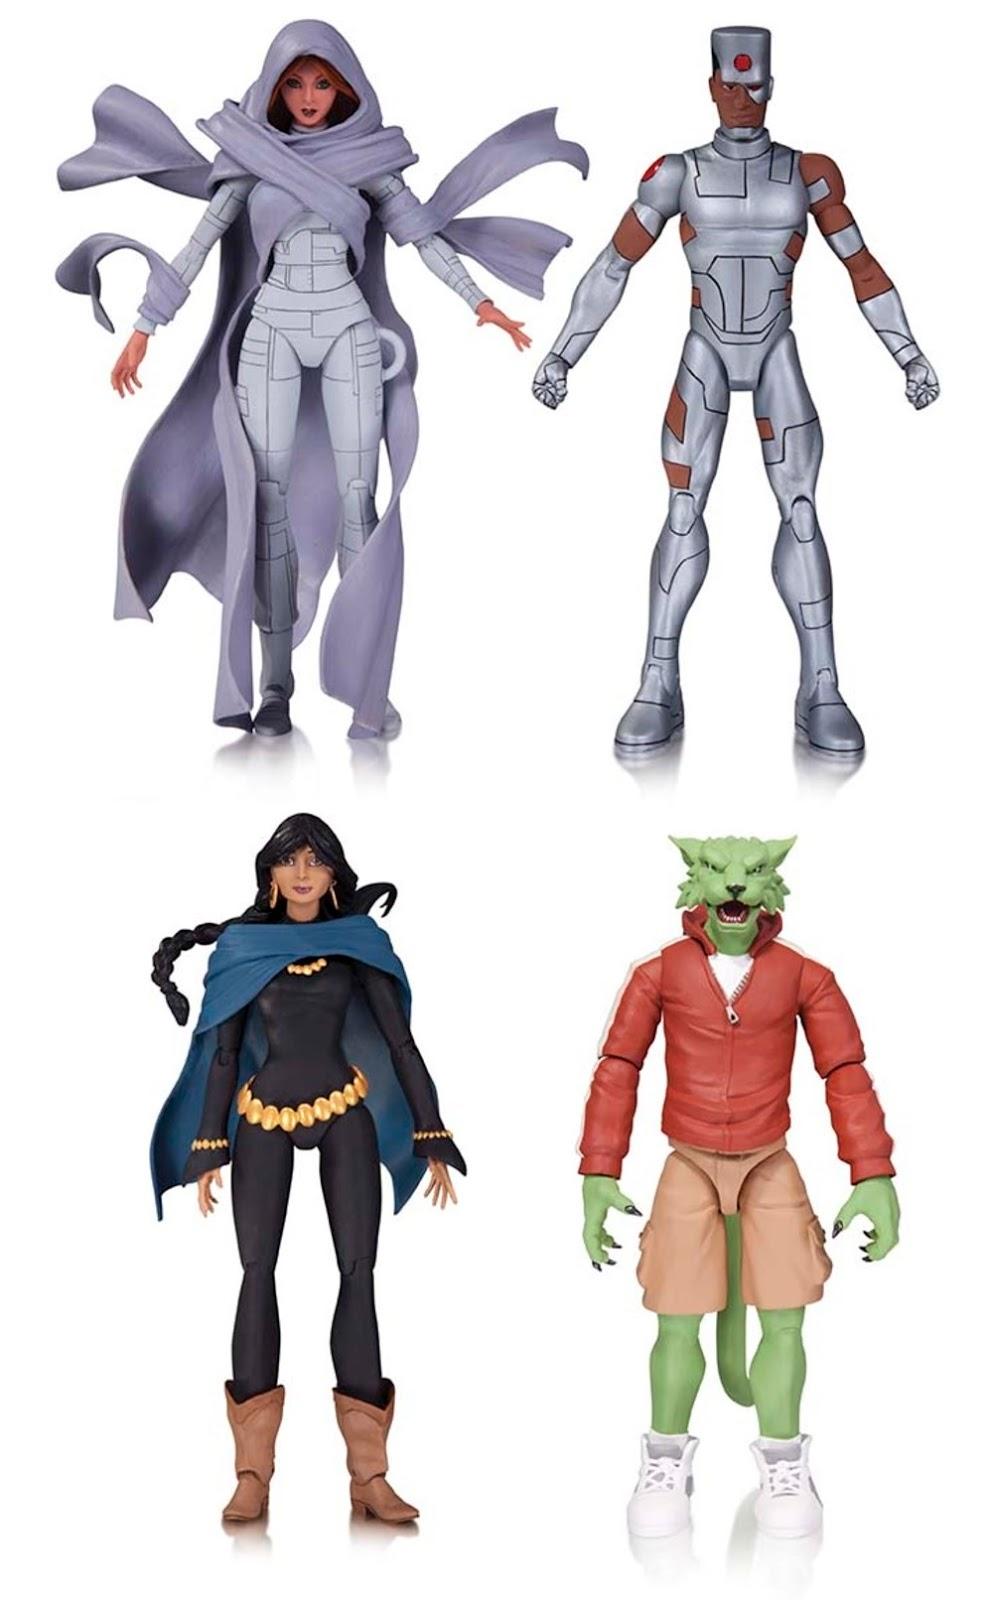 Teen Titans Toys Action Figures : The blot says dc comics terry dodson teen titans earth